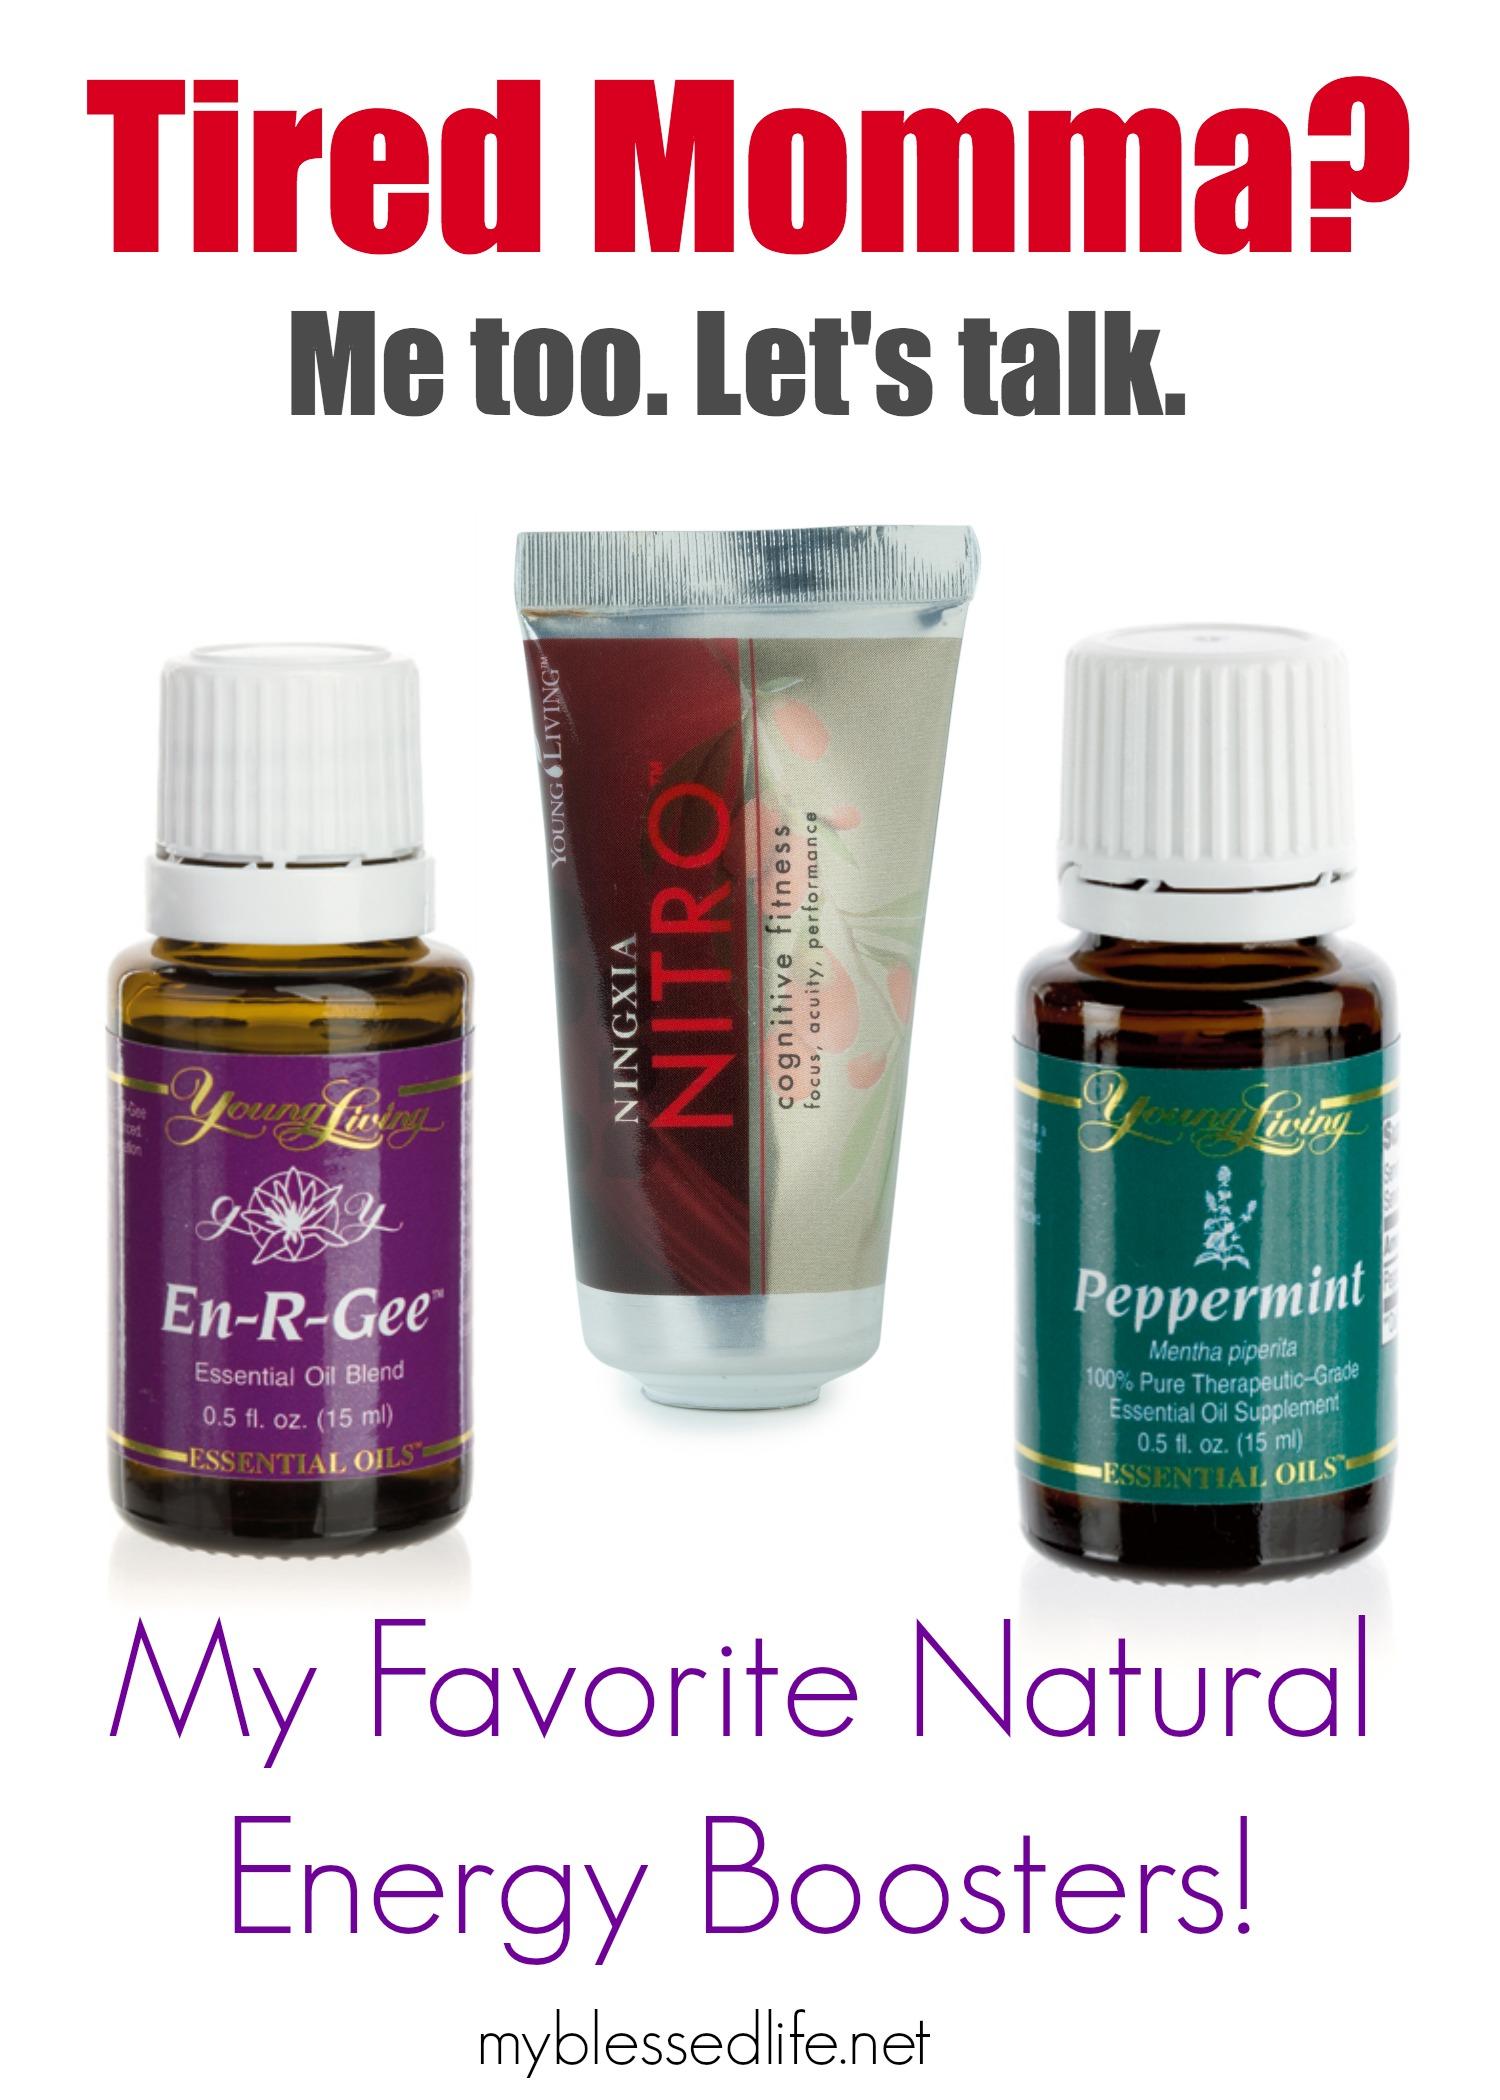 Amazing Natural Energy Boosters | MyBlessedLife.net